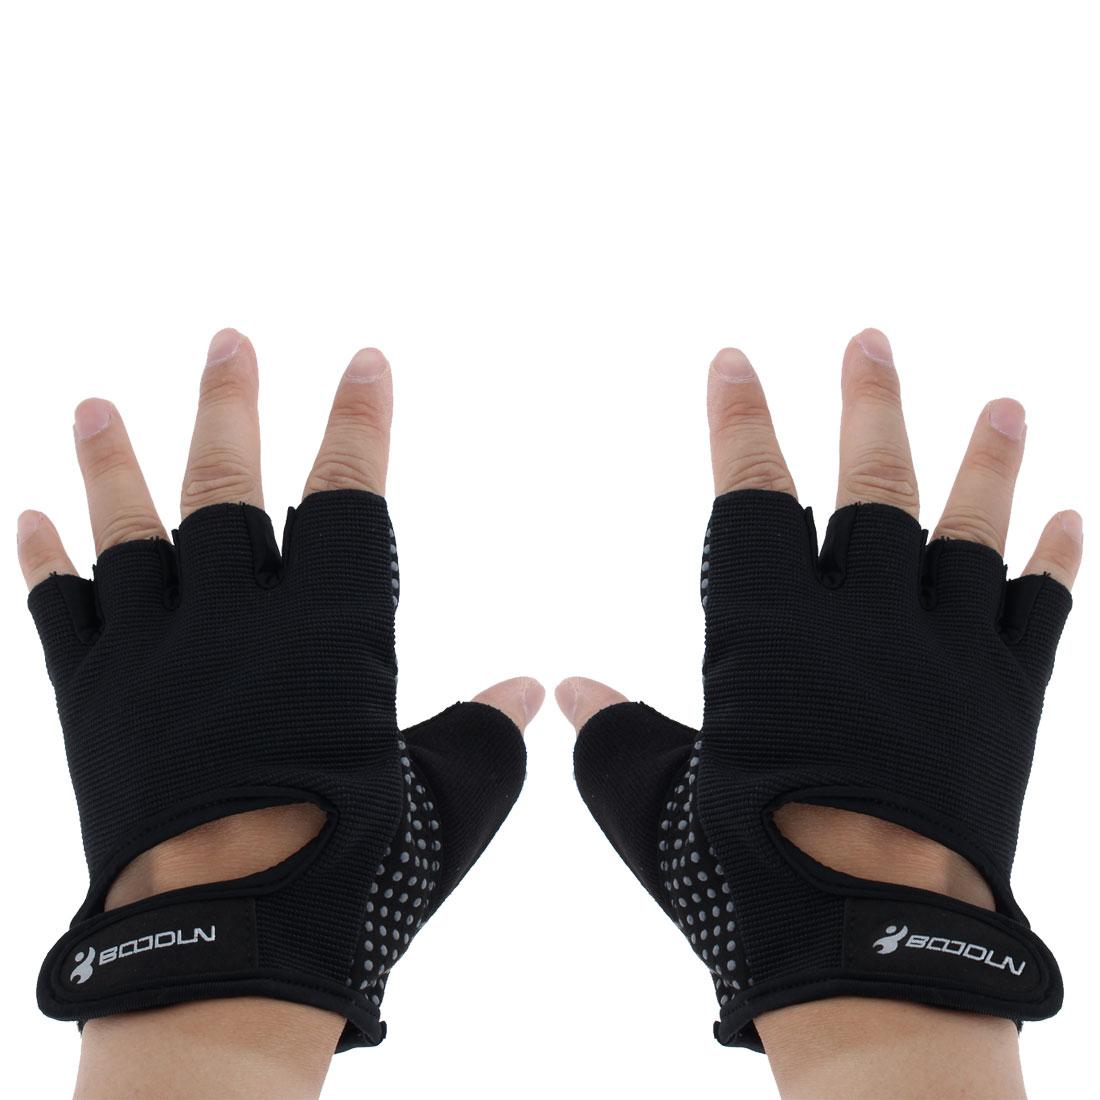 BOODUN Authorized Exercise Weight Biking Lifting Training Microfiber Non-slip Fitness Half Finger Gloves Black M